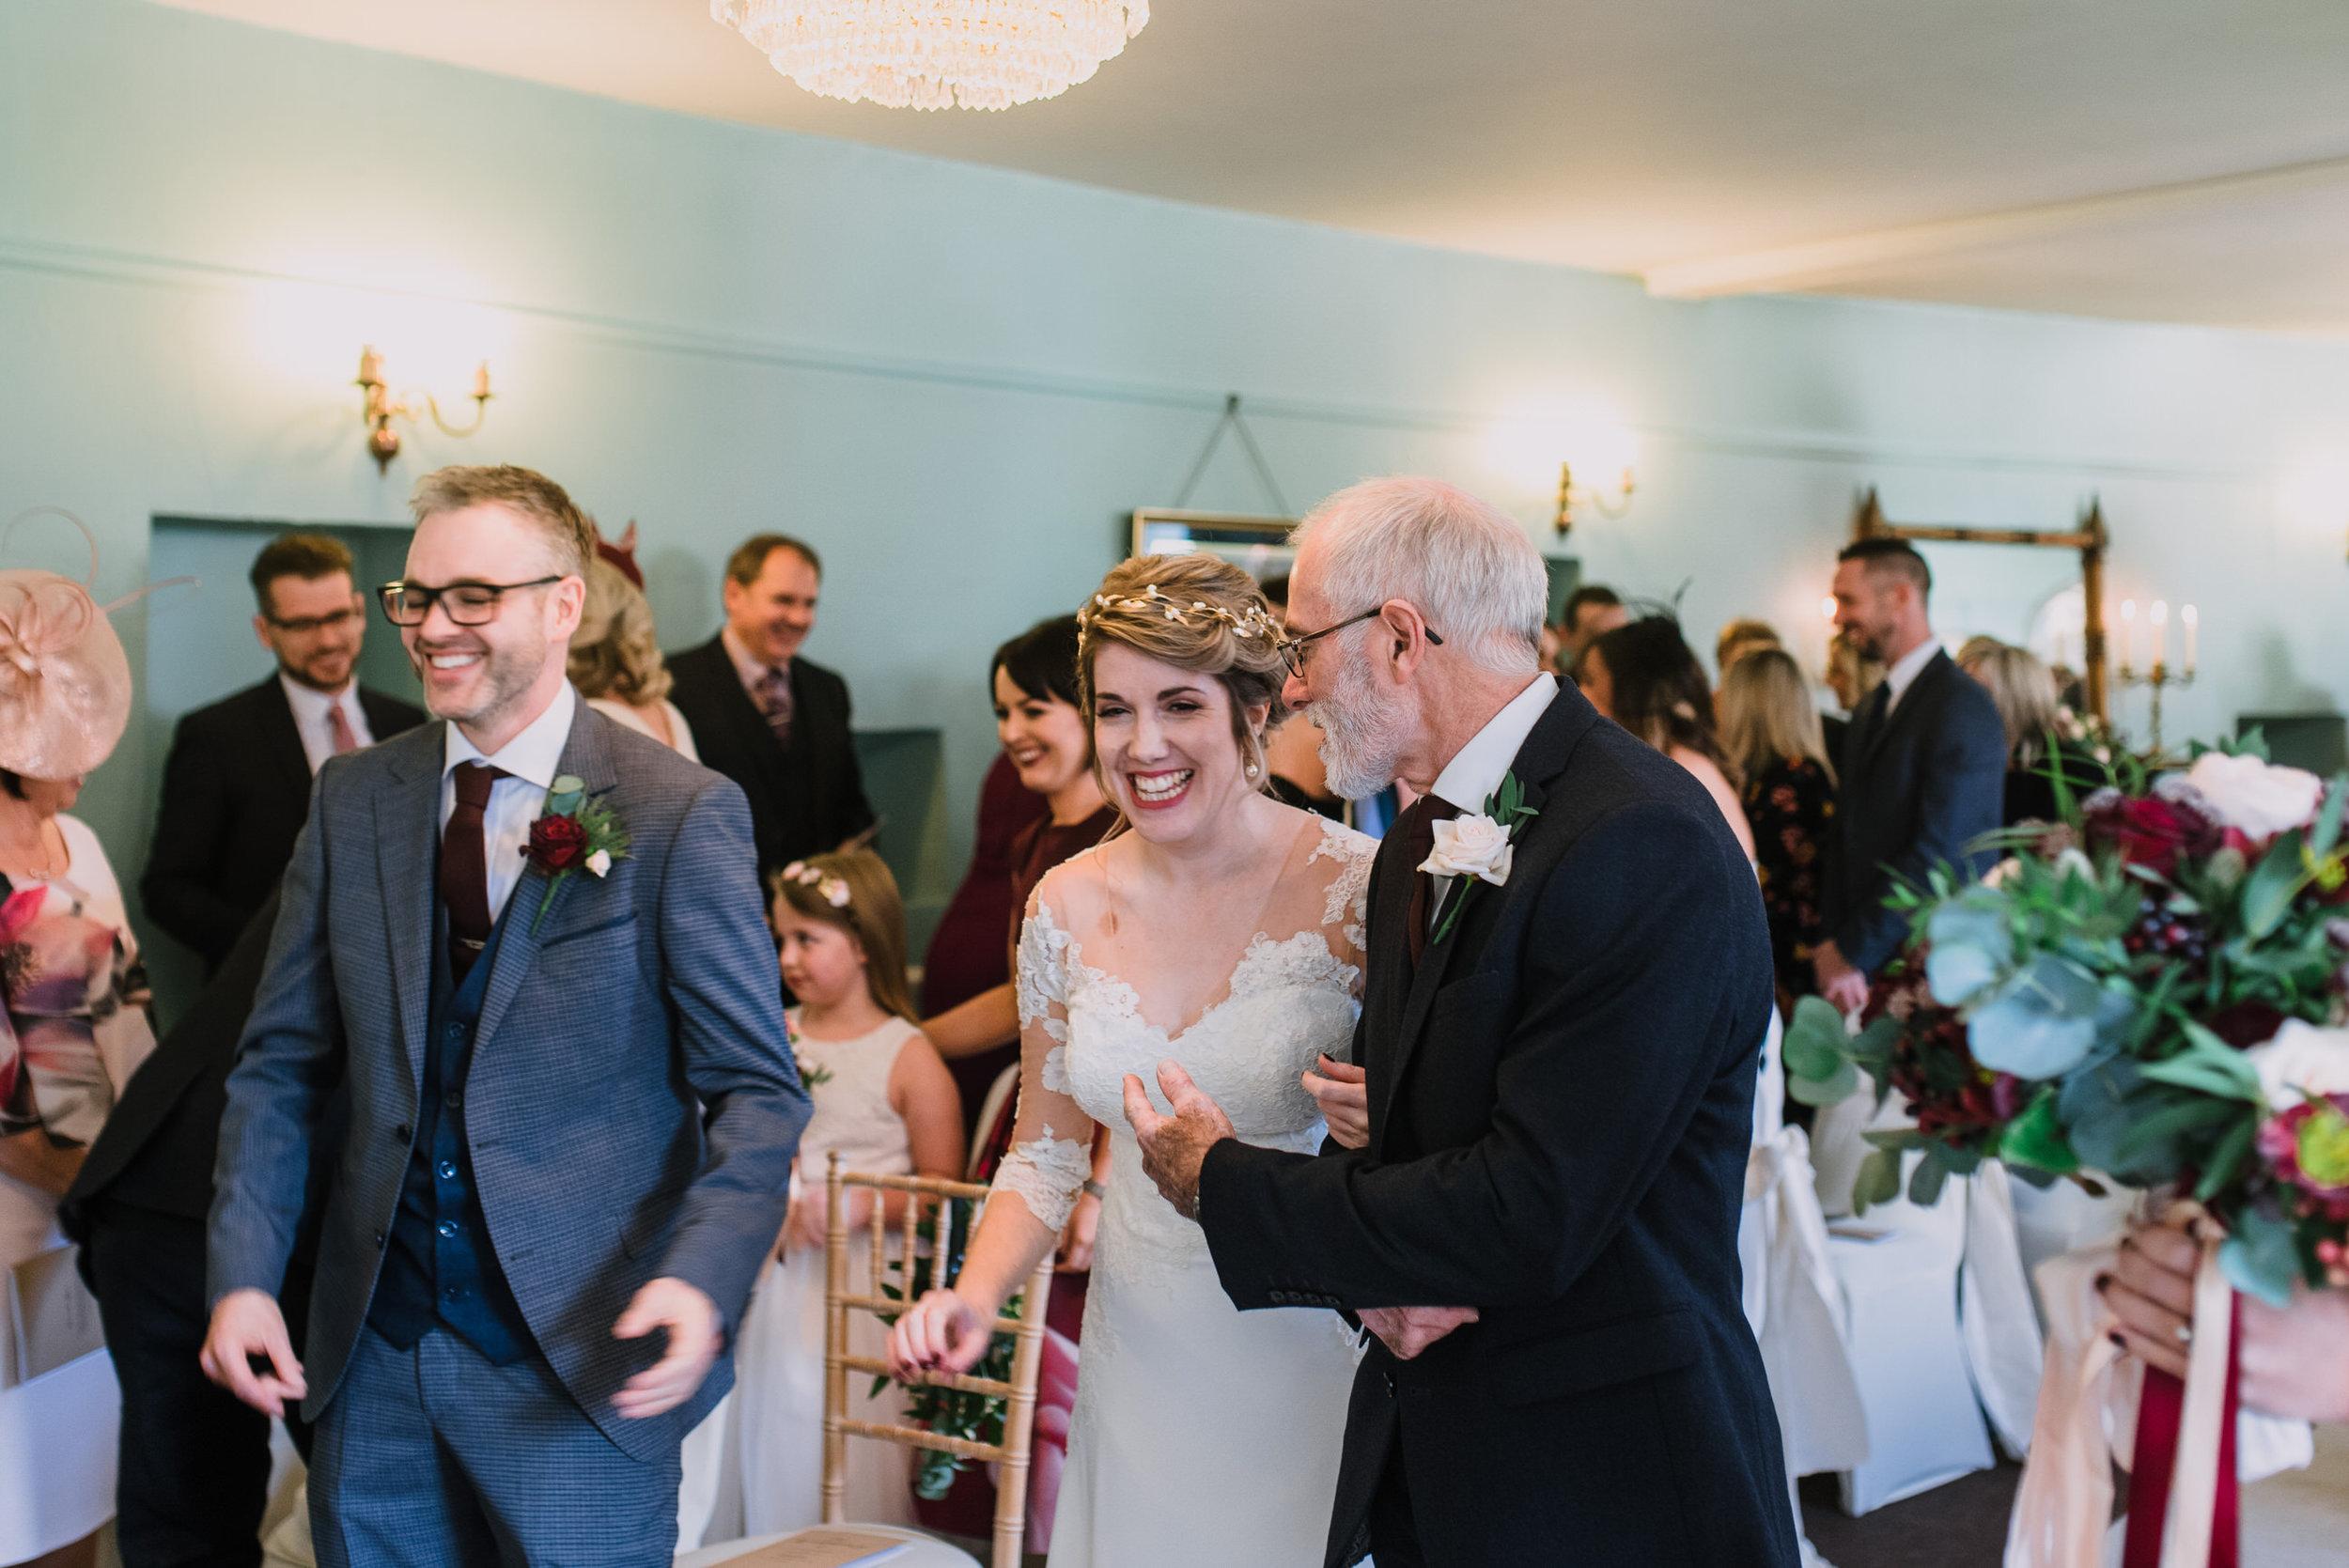 lissanoure castle wedding, northern ireland wedding photographer, romantic northern irish wedding venue, castle wedding ireland, natural wedding photography ni (51).jpg